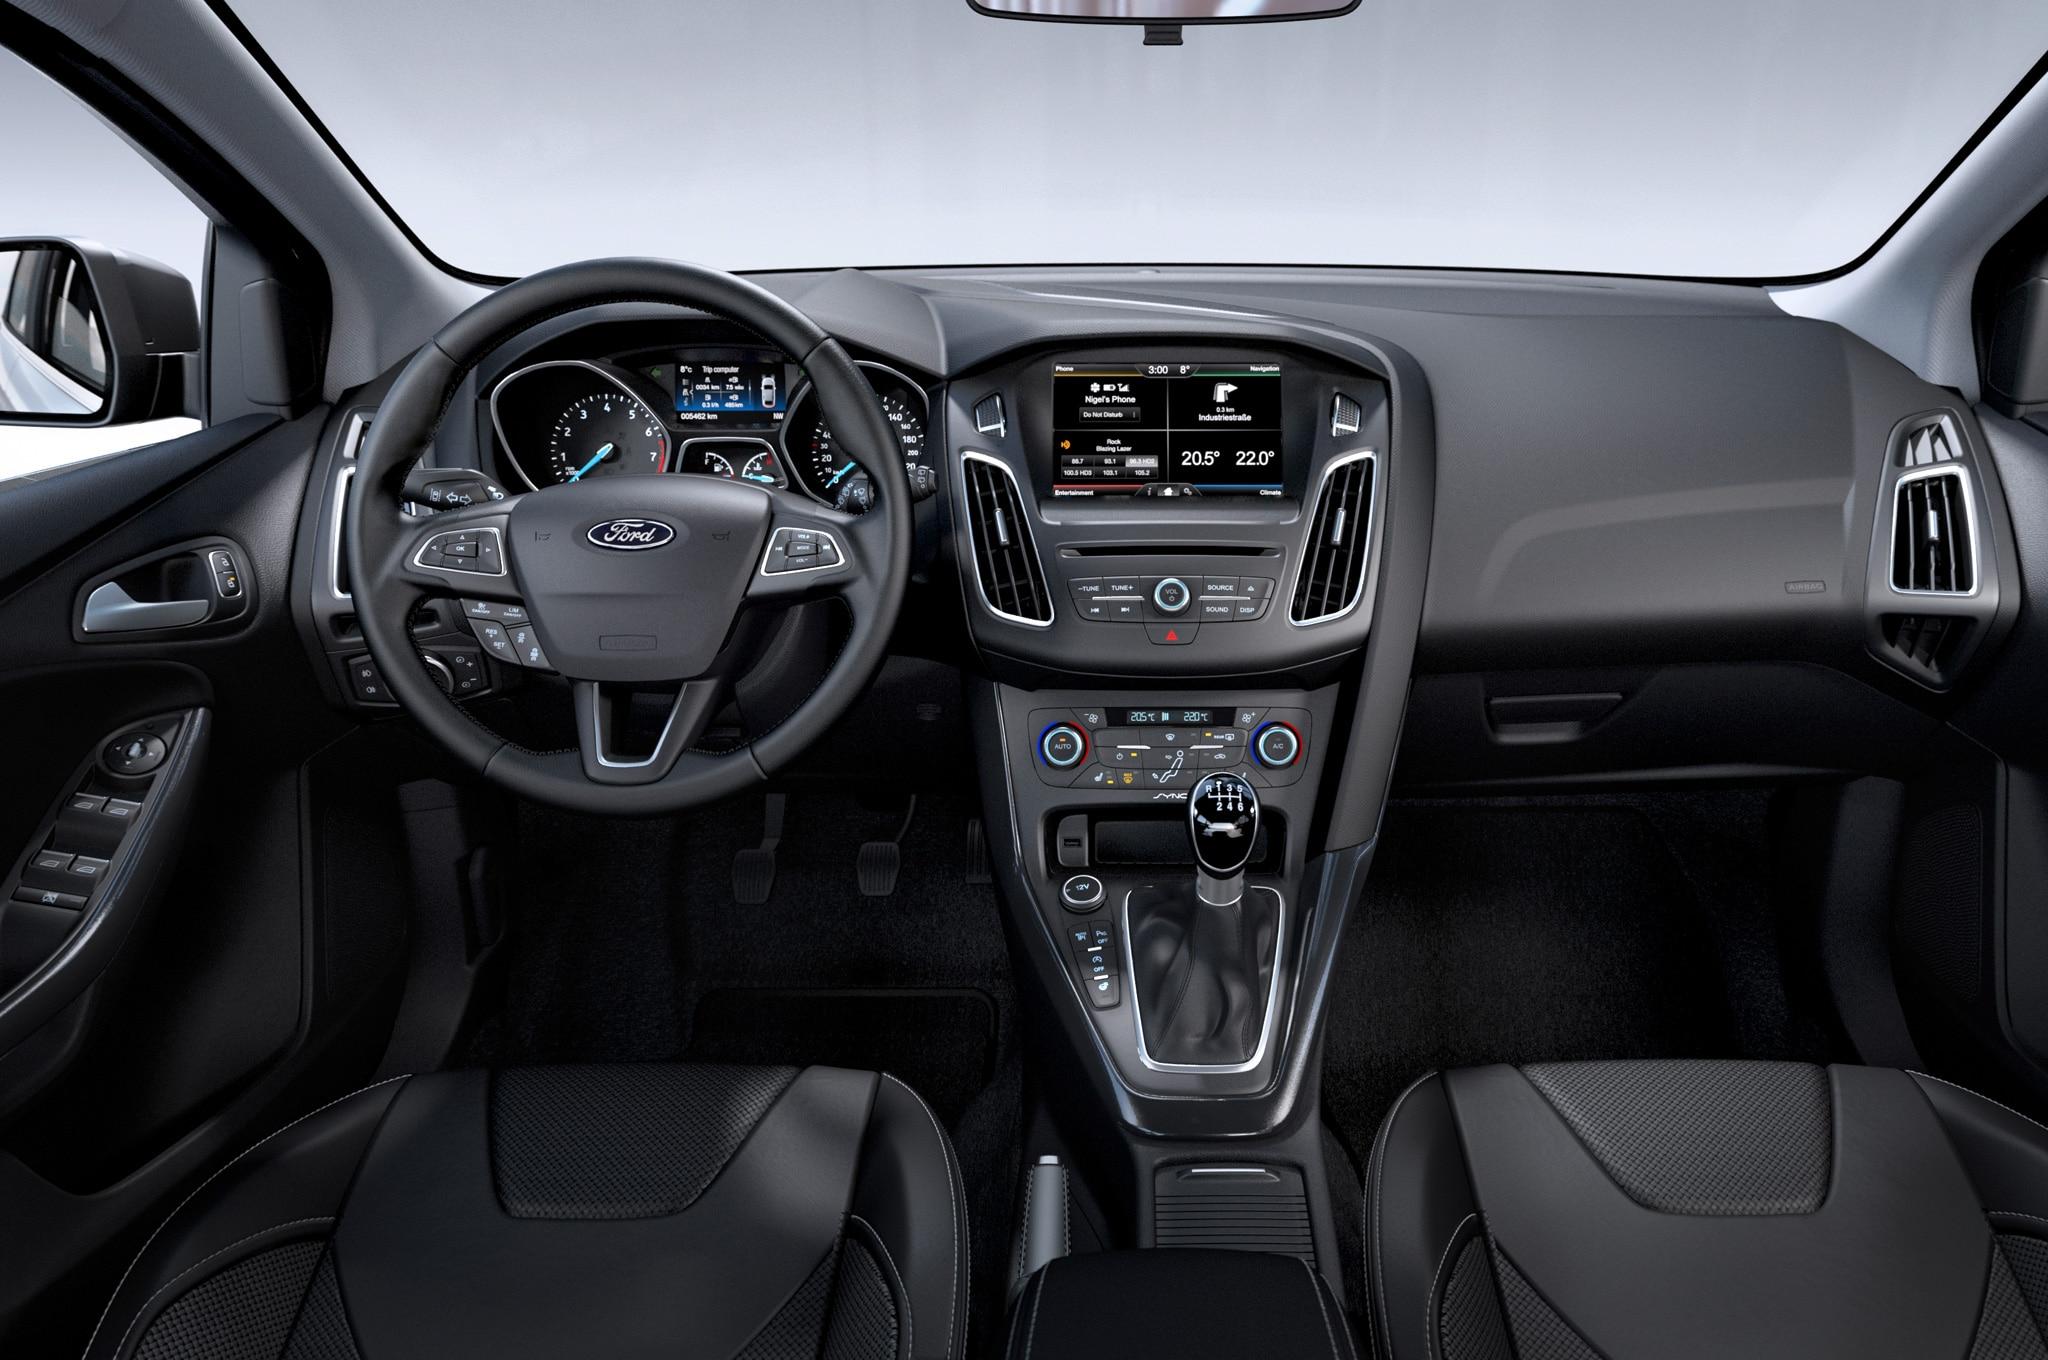 2015 ford focus hatchback interior - Ford Focus 2012 Hatchback Interior